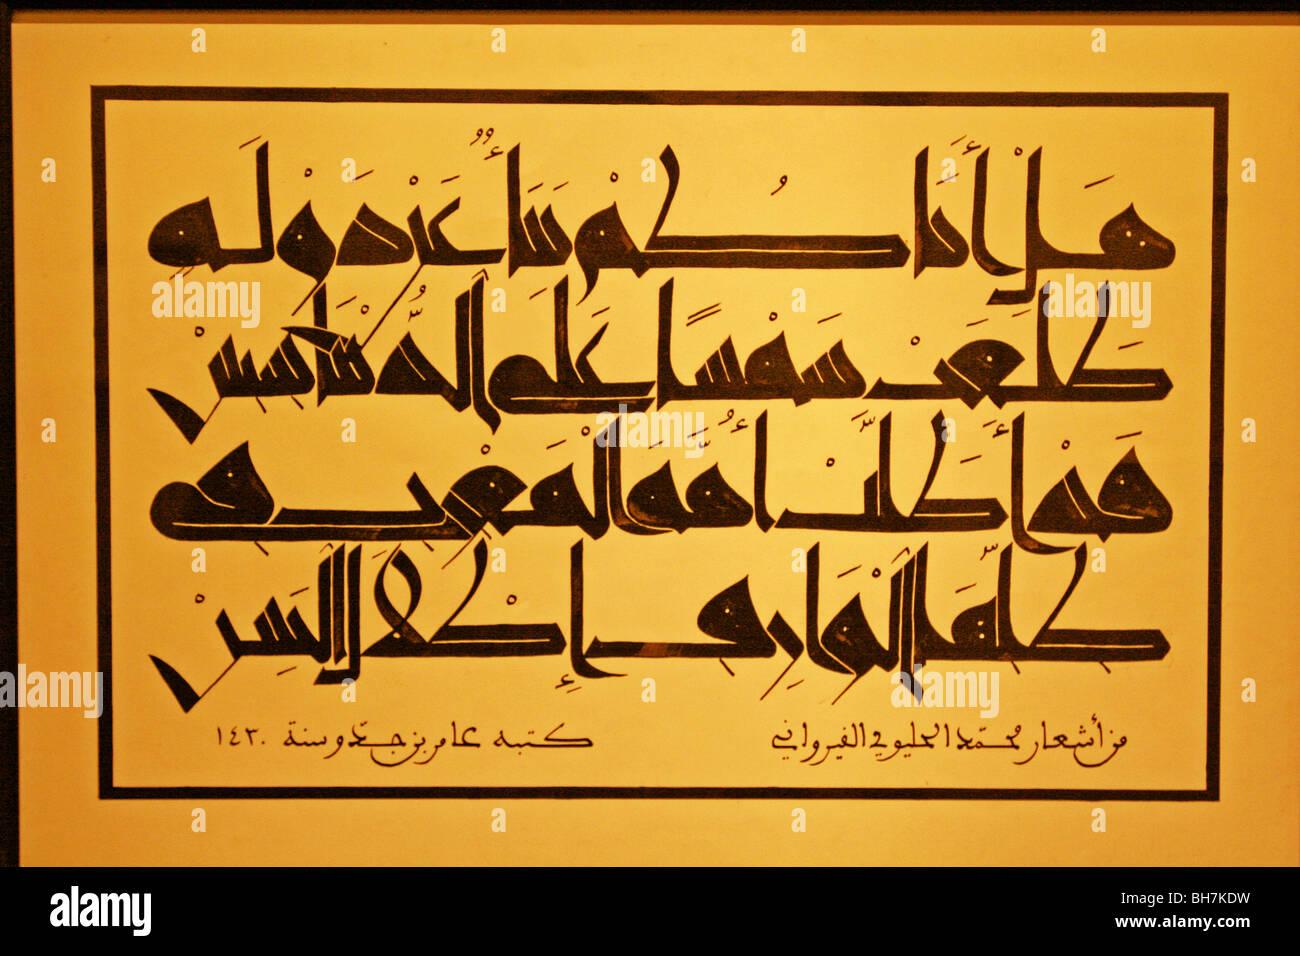 Arabic caligraphy of Koran - Stock Image